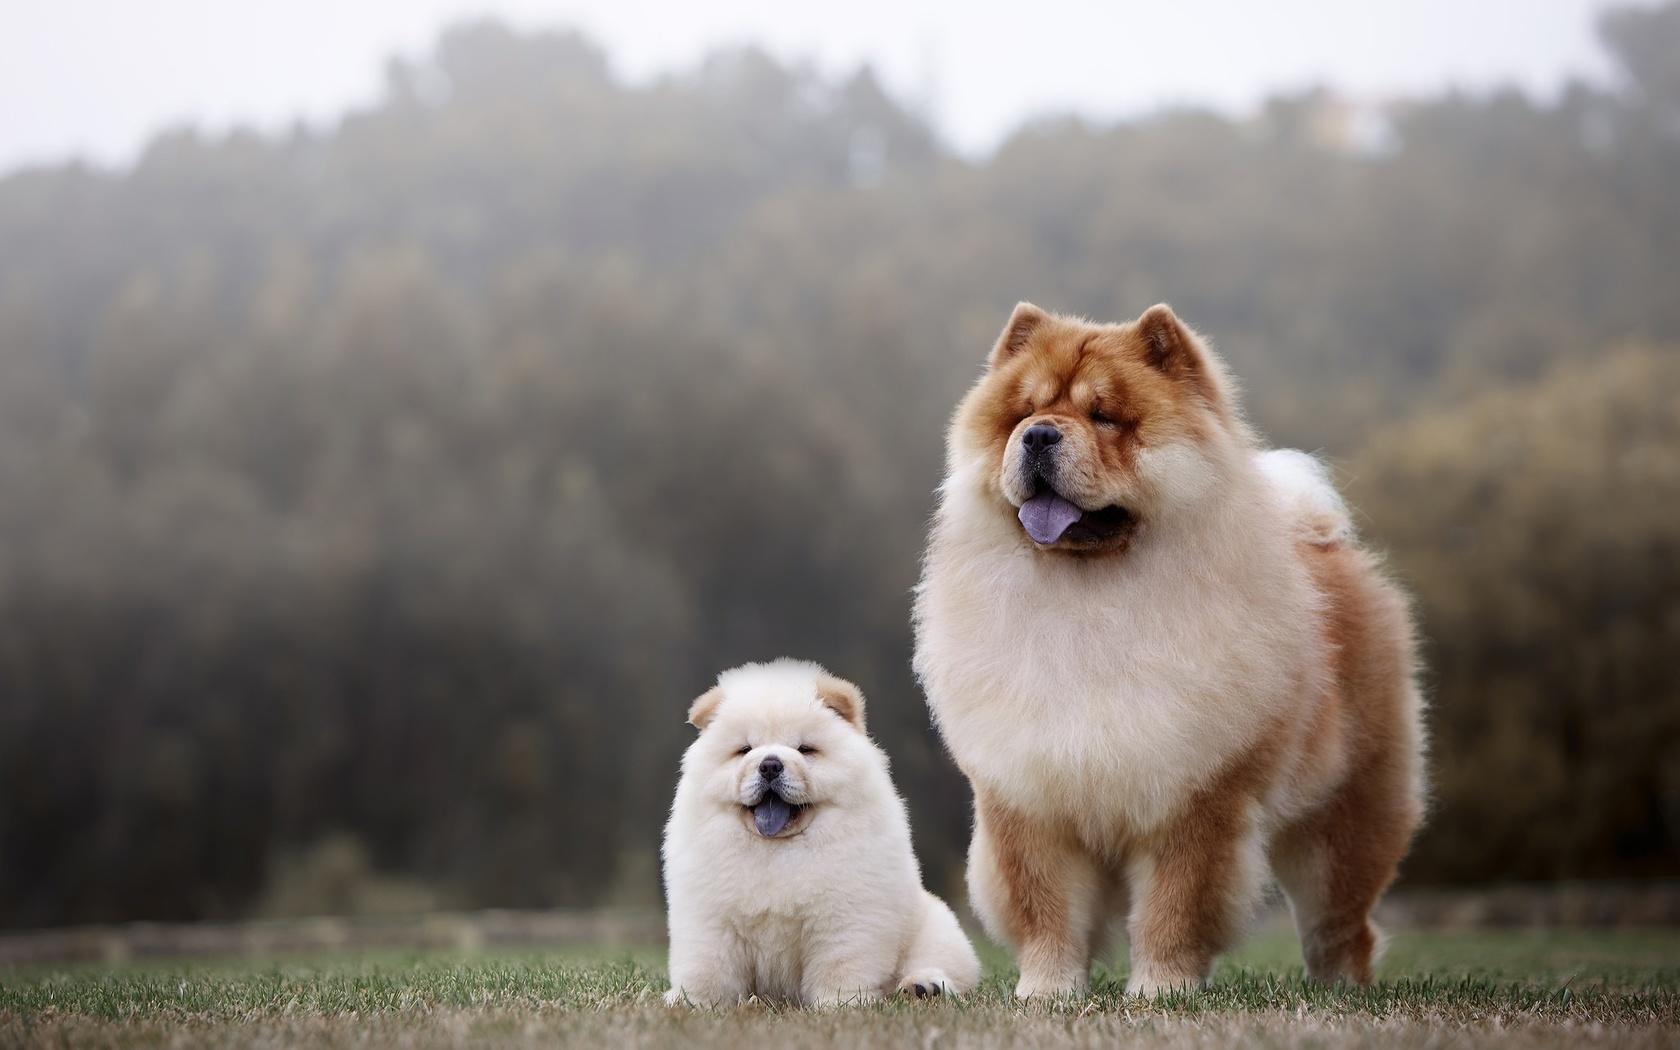 животные, собаки, пара, чау-чау, щенок, детёныш, природа, трава